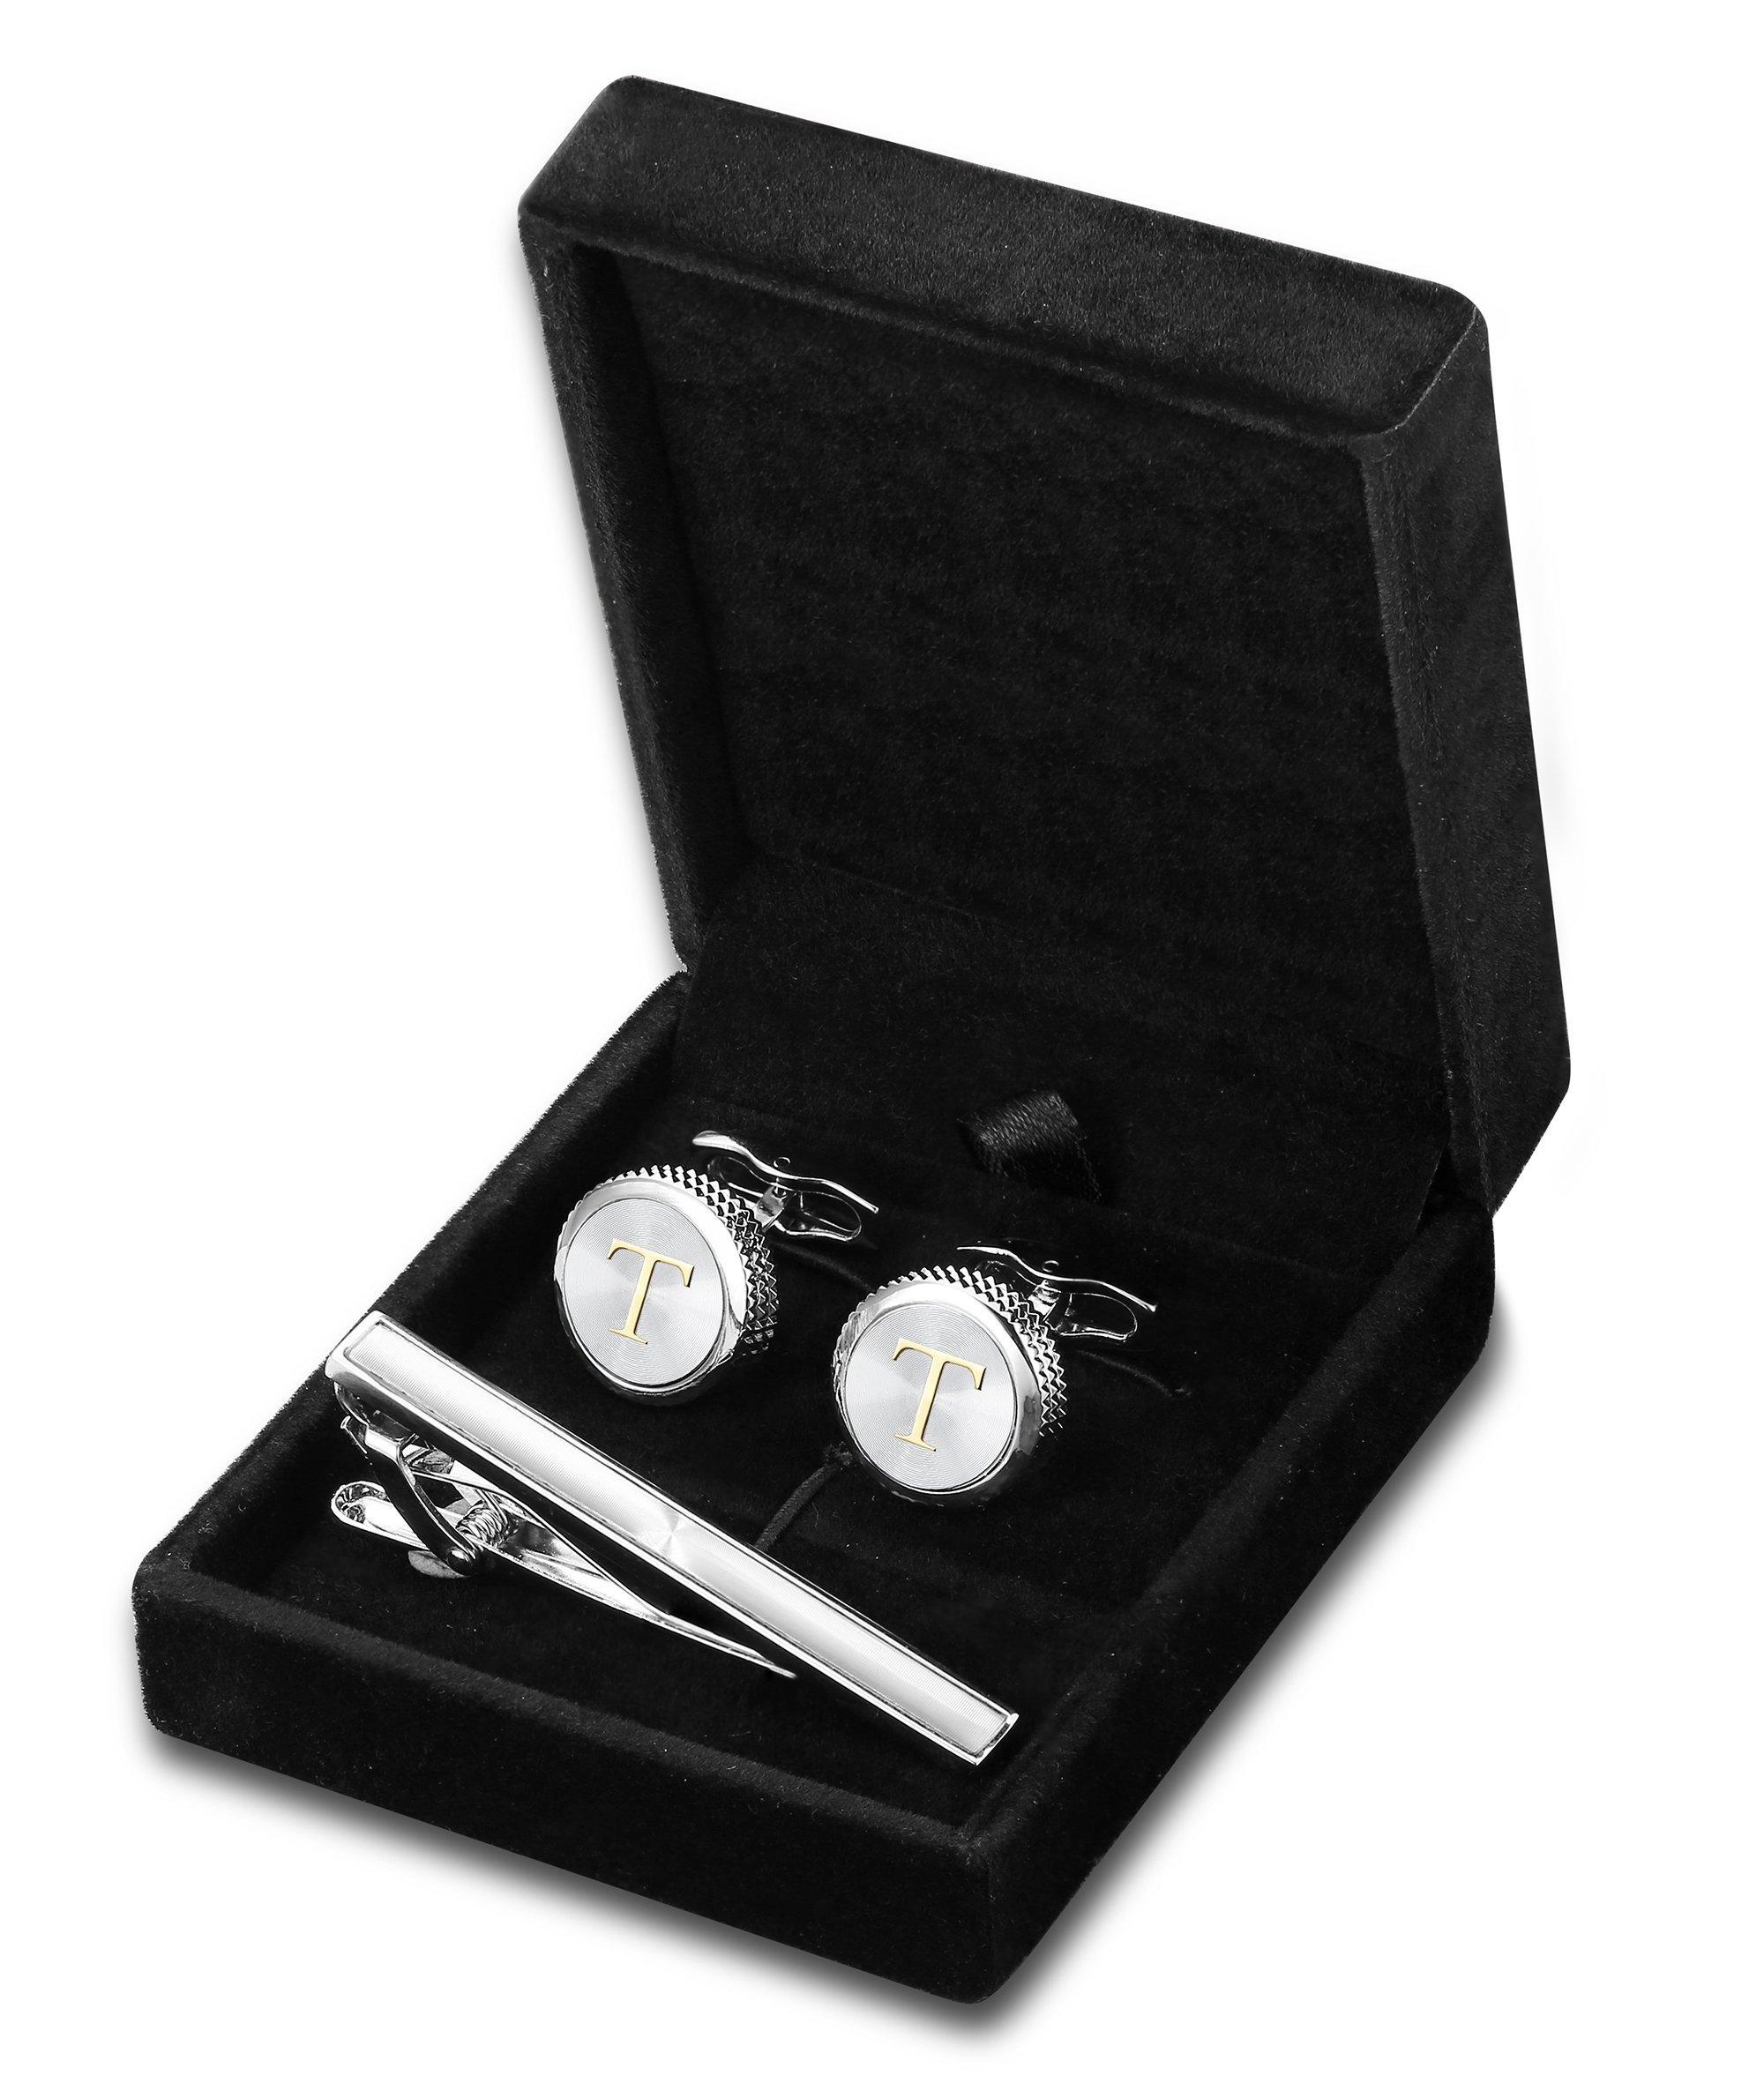 FIBO STEEL Personalized Initial Cufflinks Tie Clips Set for Men Gifts Custom Letter Wedding Cufflinks Case T